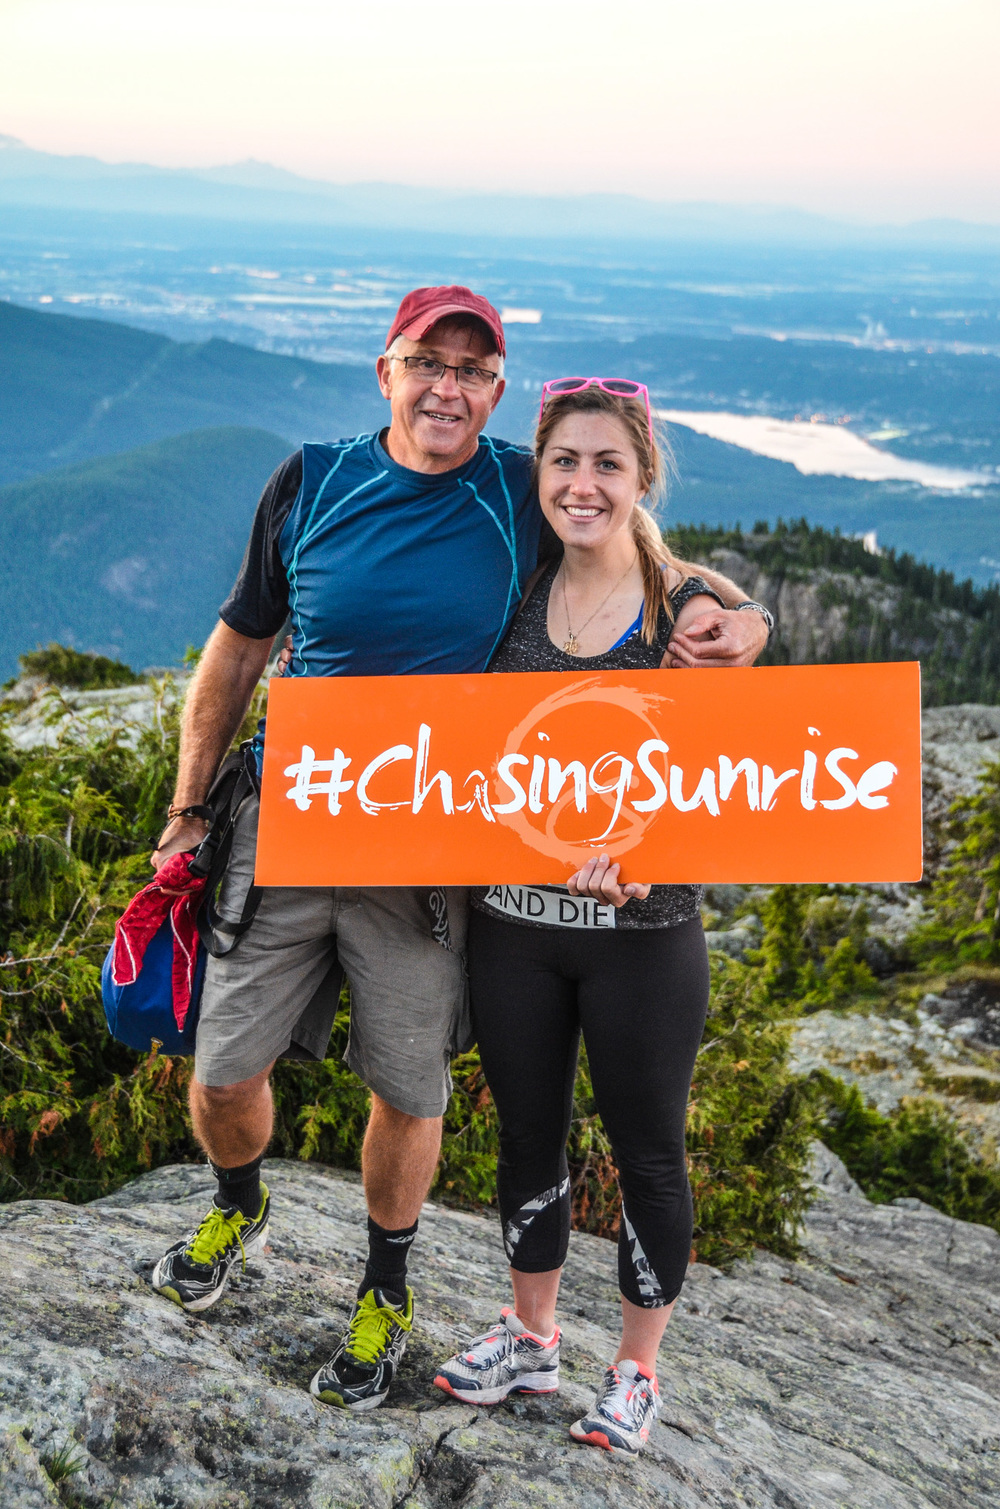 20150621 - Summer Solstice Chasing Sunrise-17.jpg